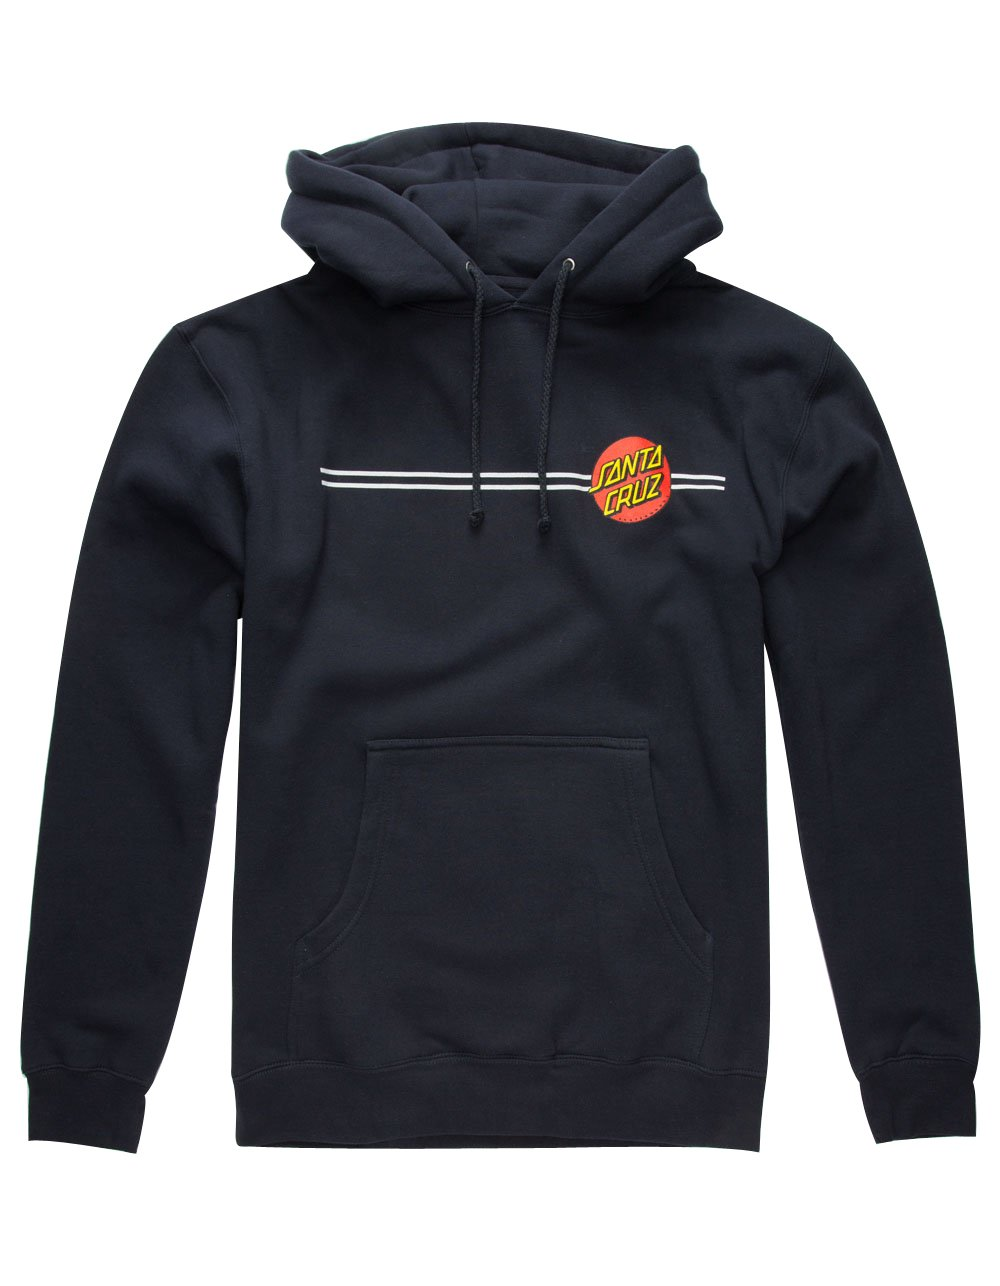 Santa Cruz Skateboards Classic Dot Hooded Pullover Sweatshirt Large, Black